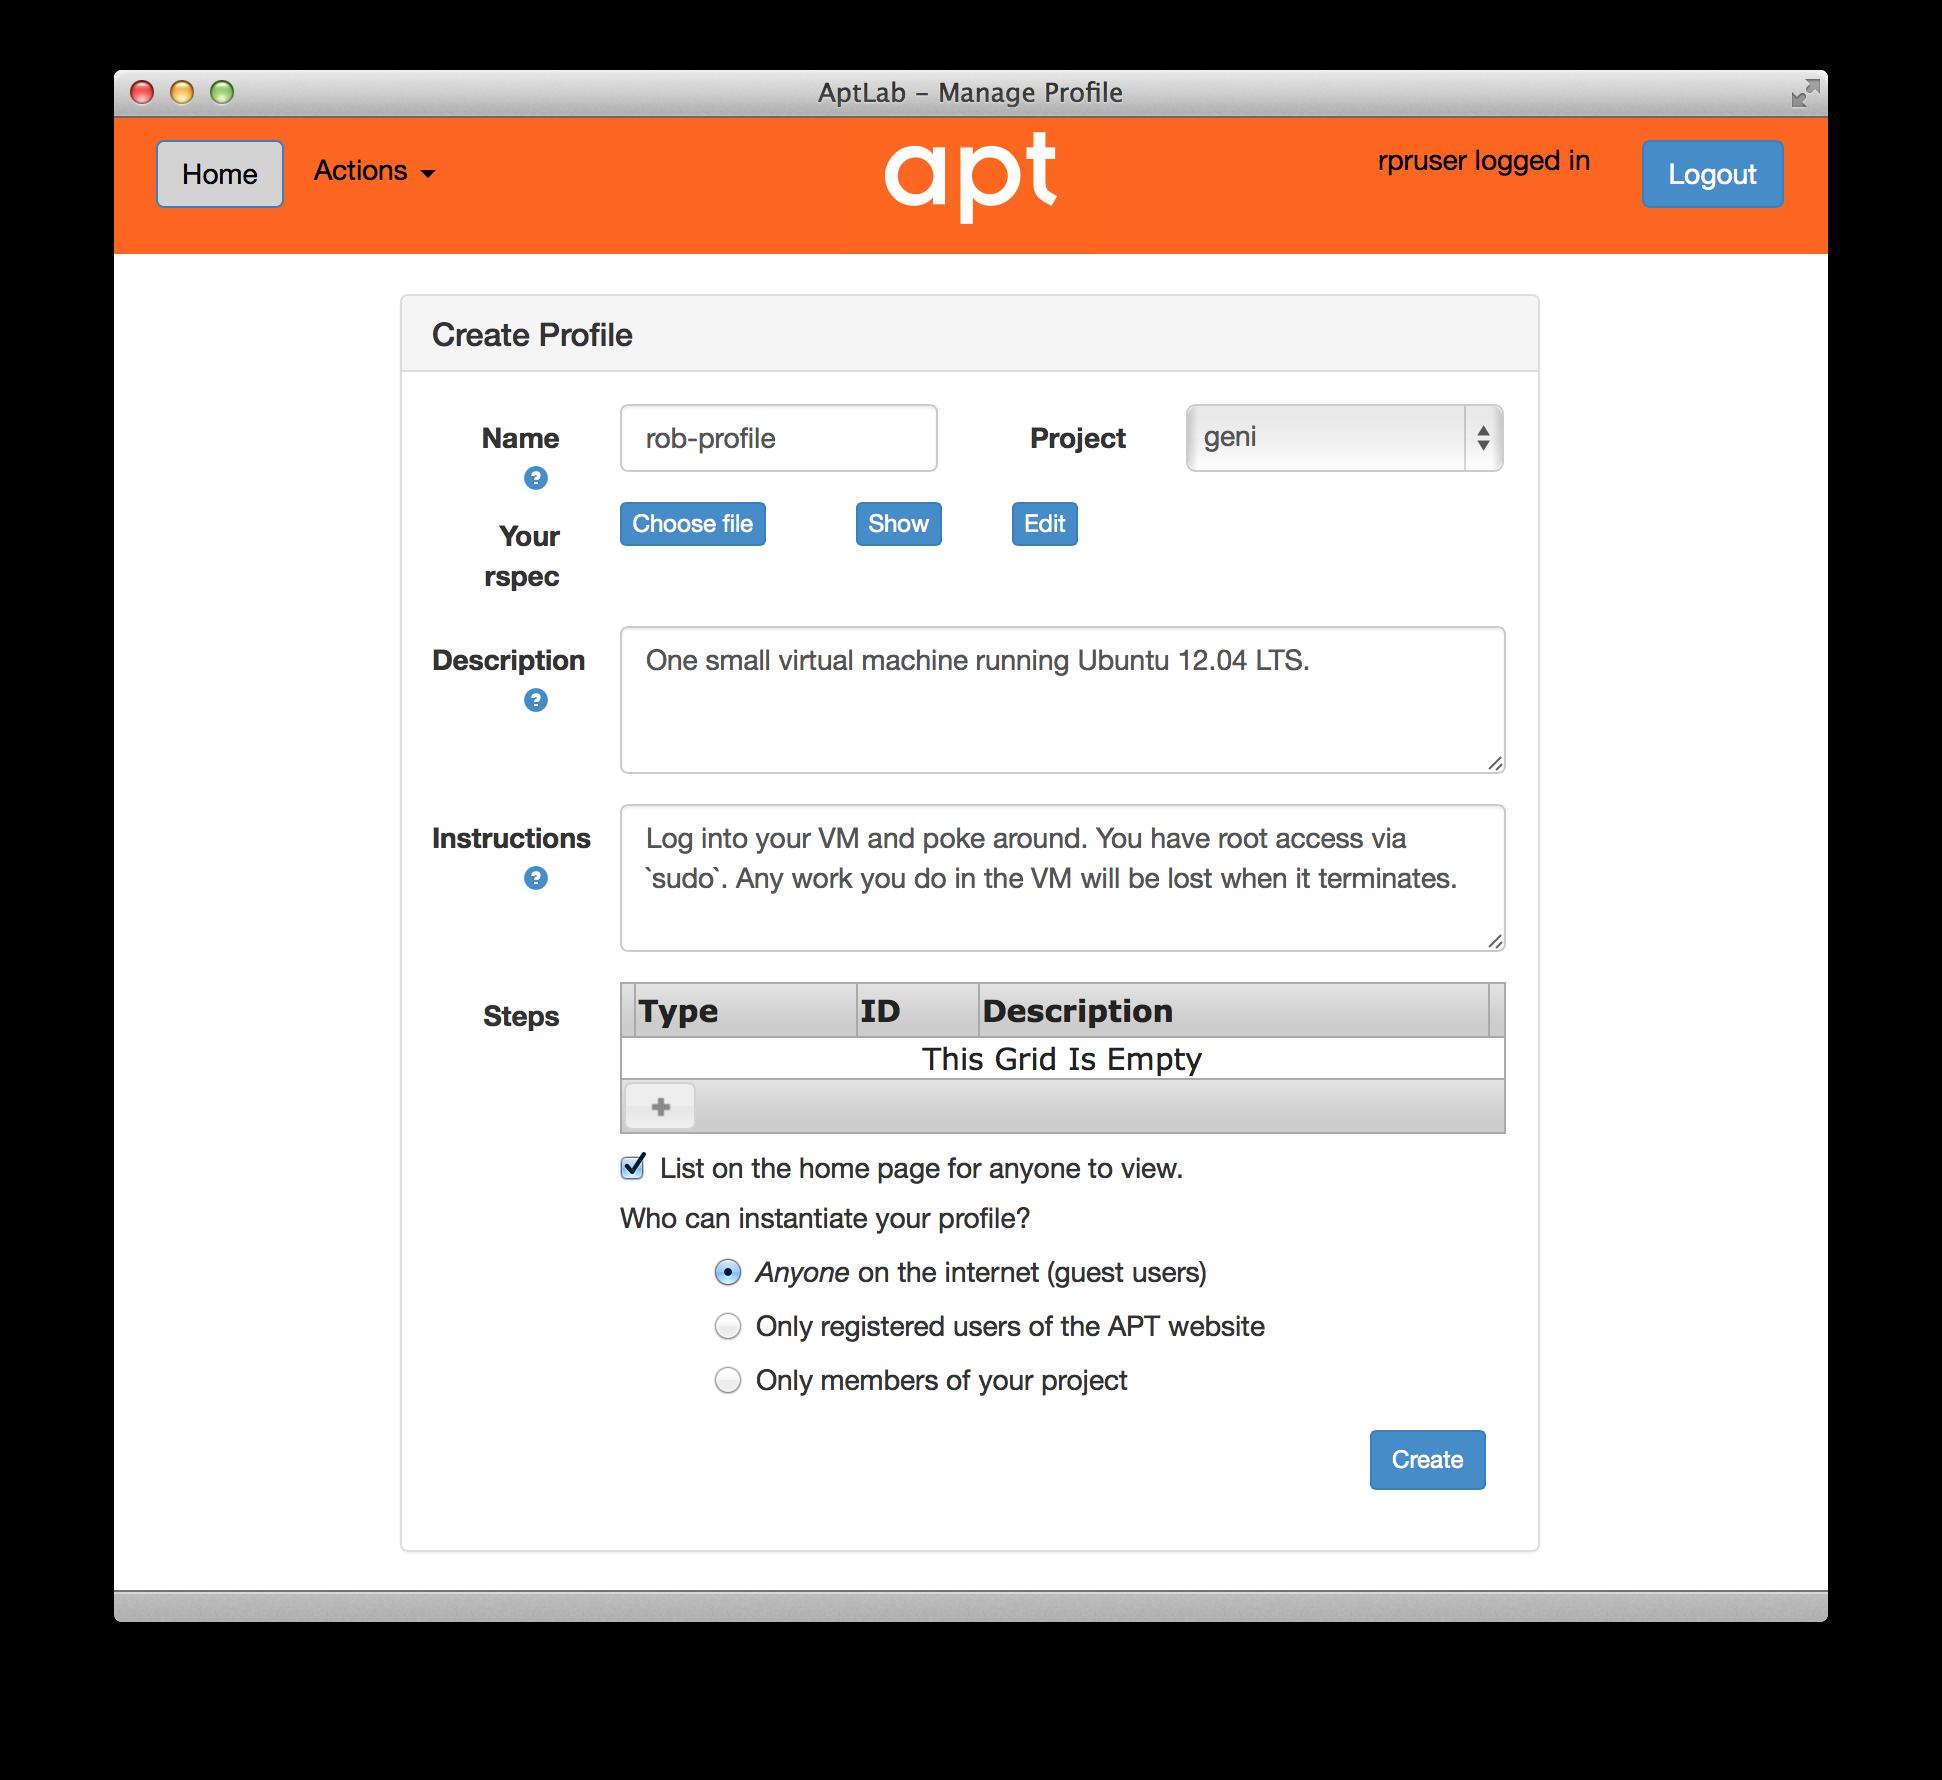 screenshots/apt/create-profile-form.png